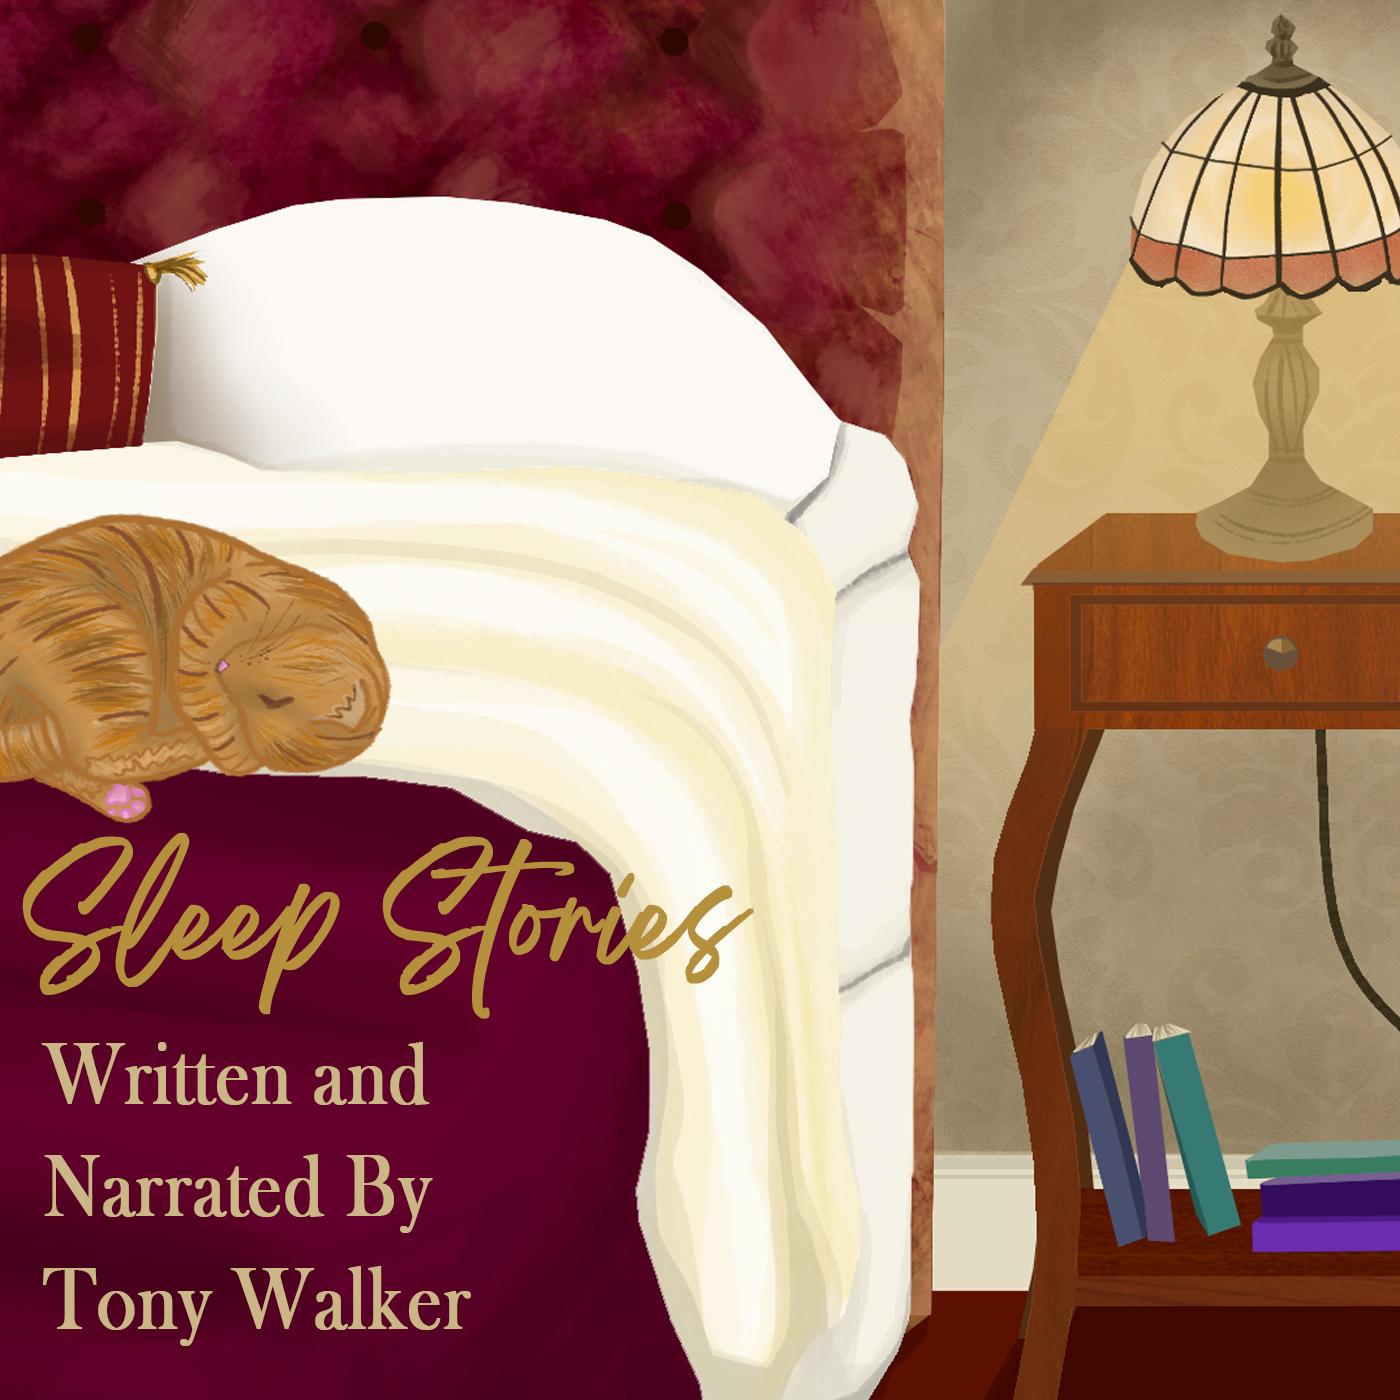 Sleep Stories by Tony Walker